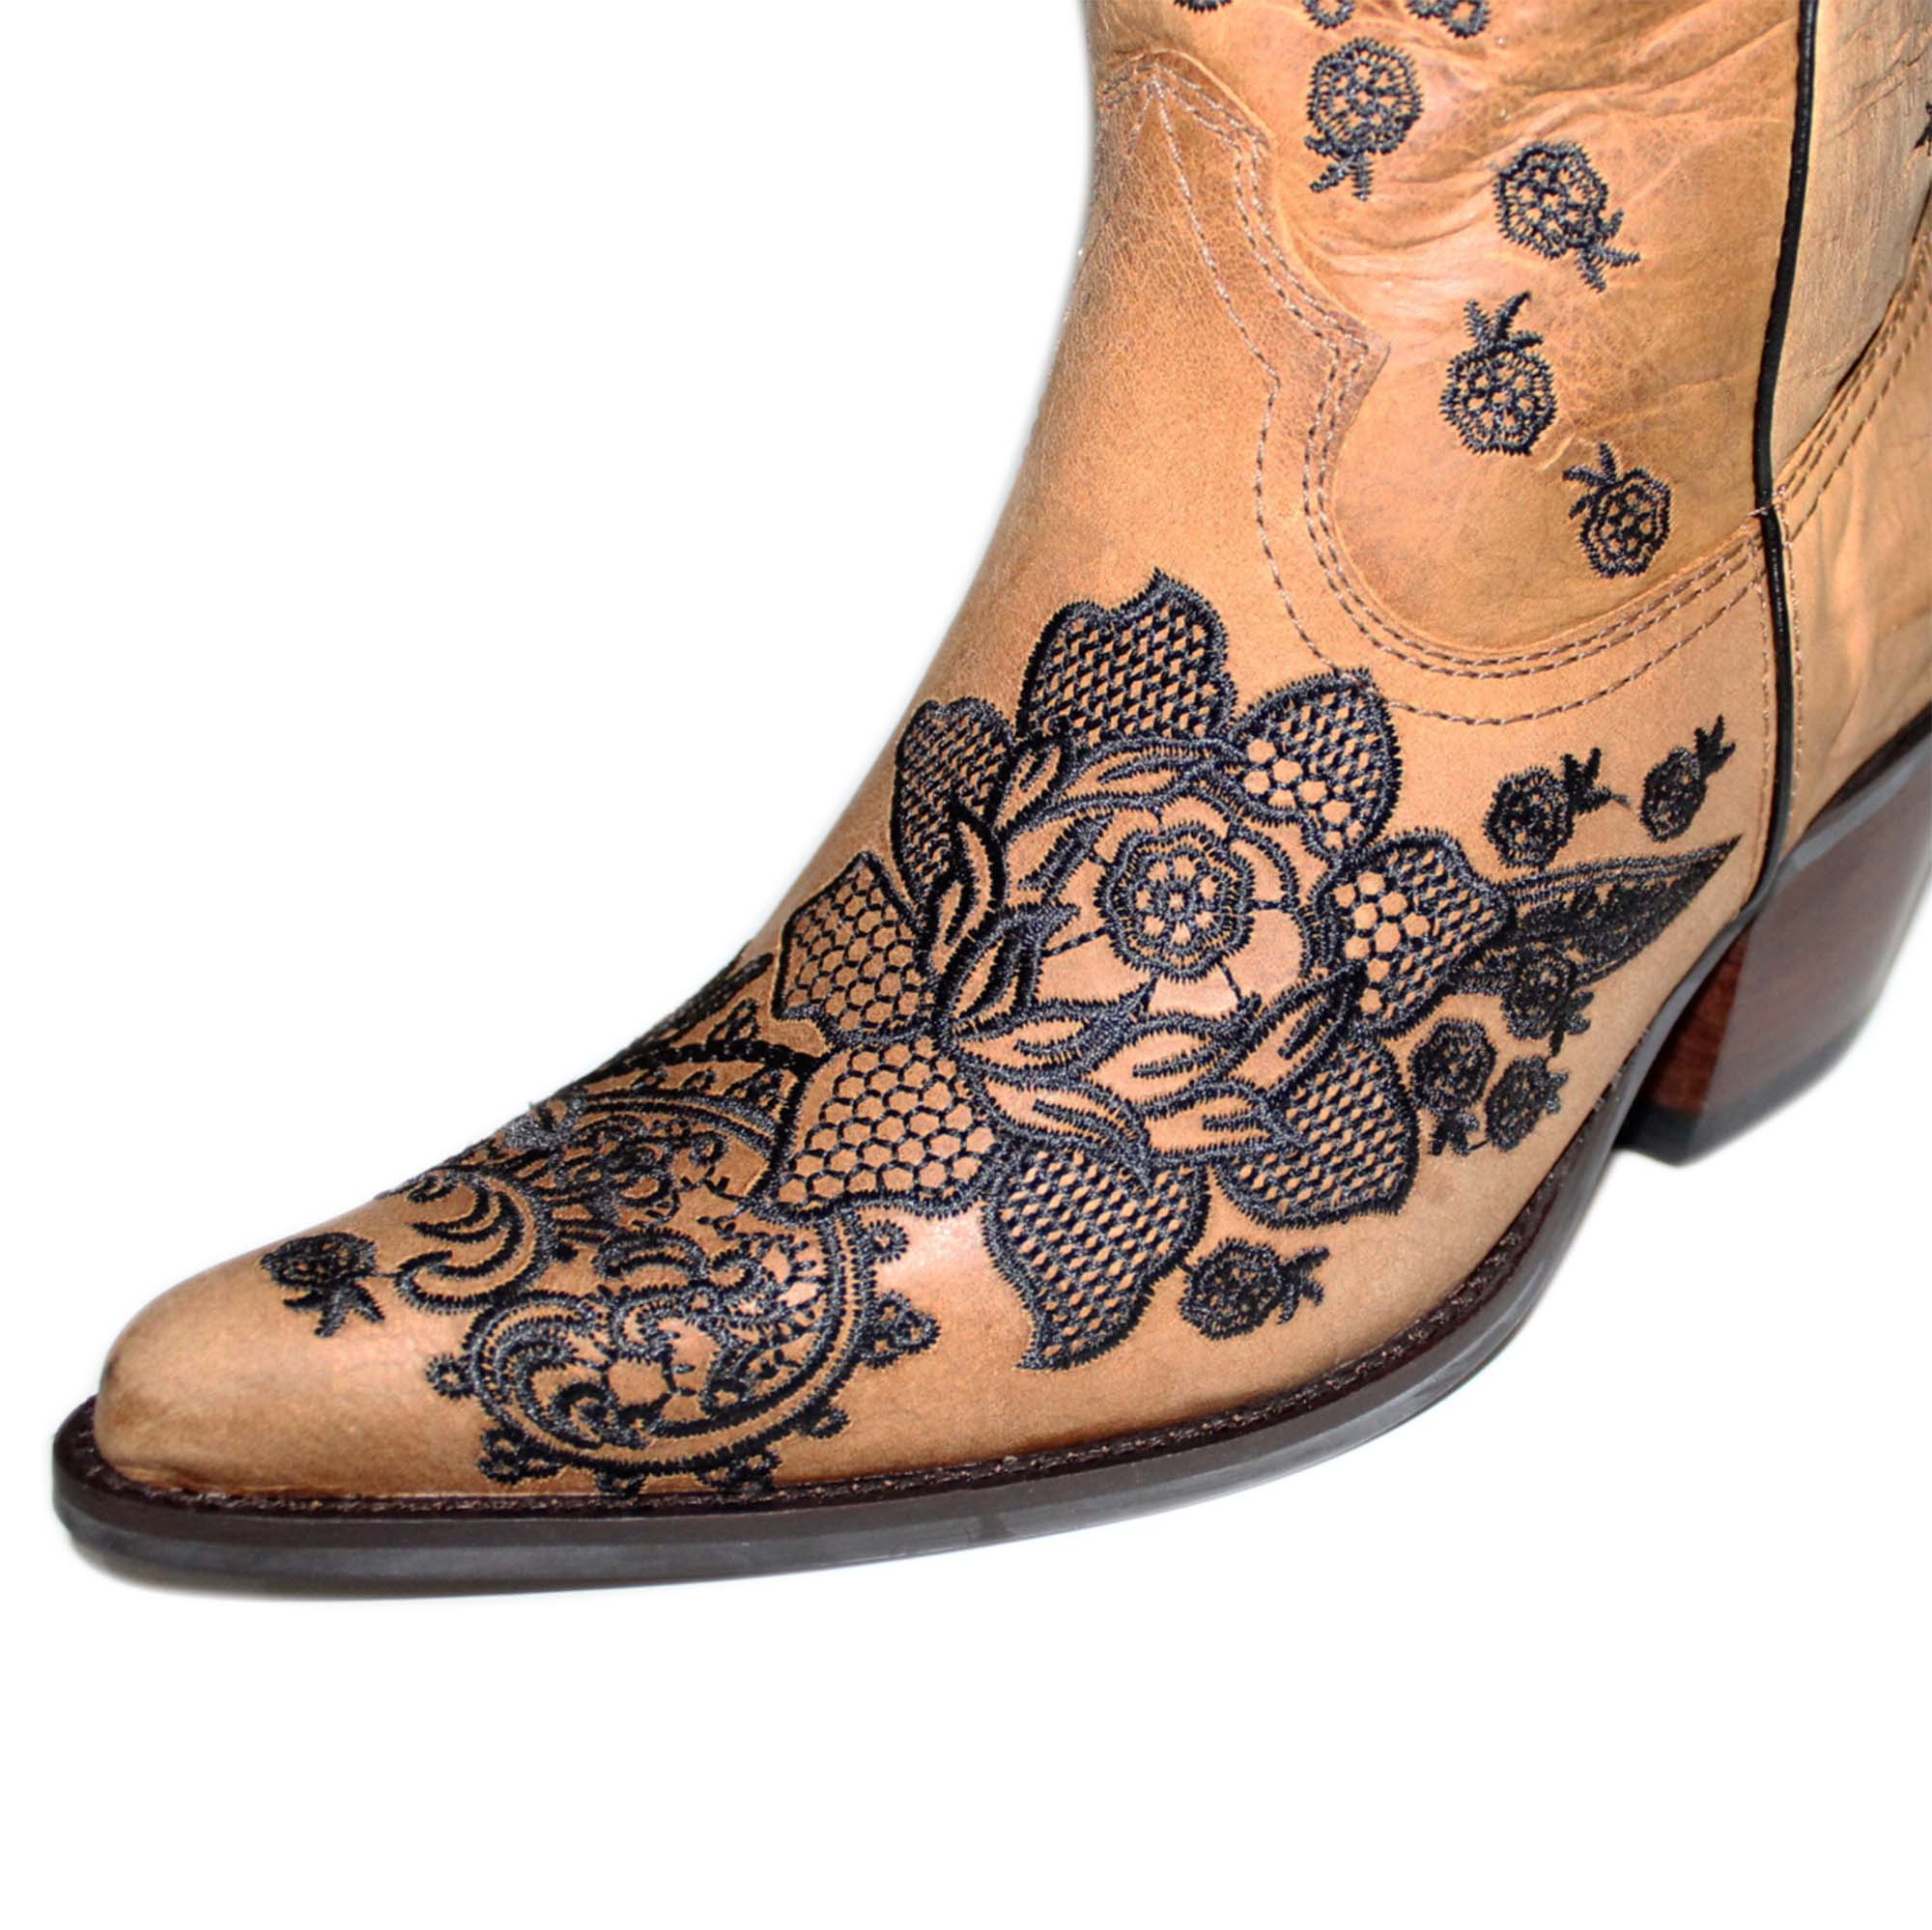 Bota Vimar Boots Feminina Couro Fossil Caramelo